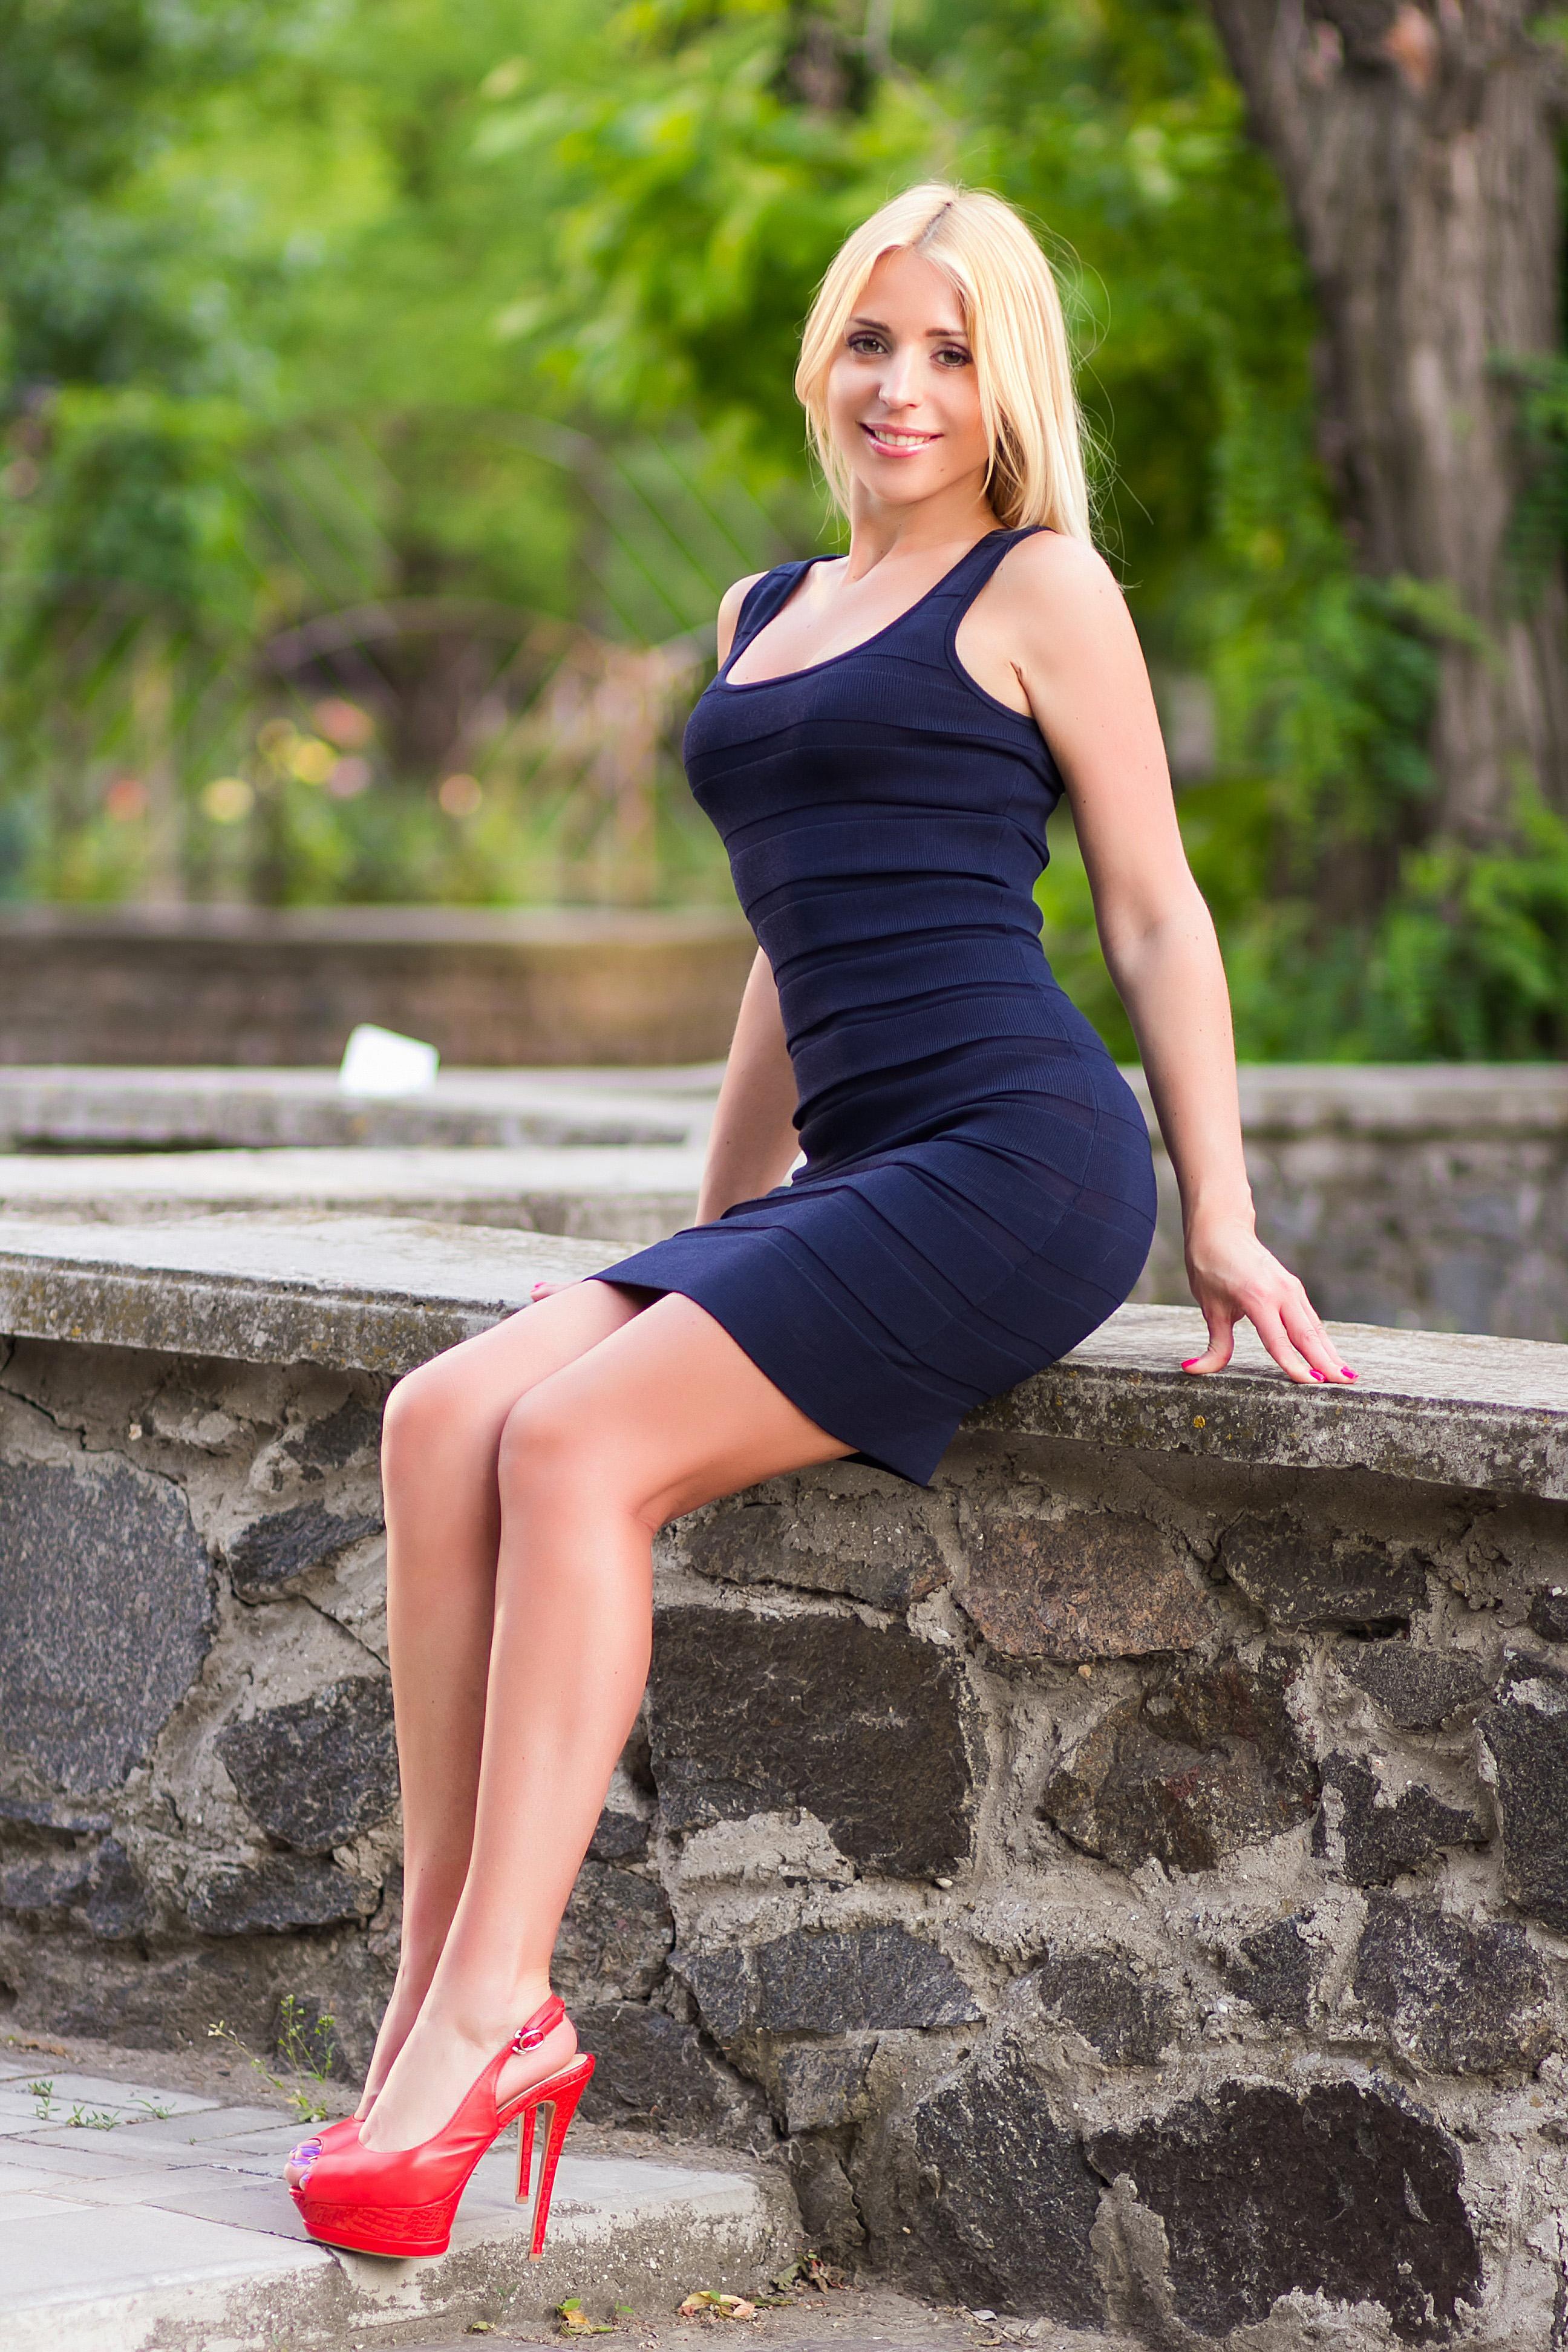 personals-russian-women-seeking-date